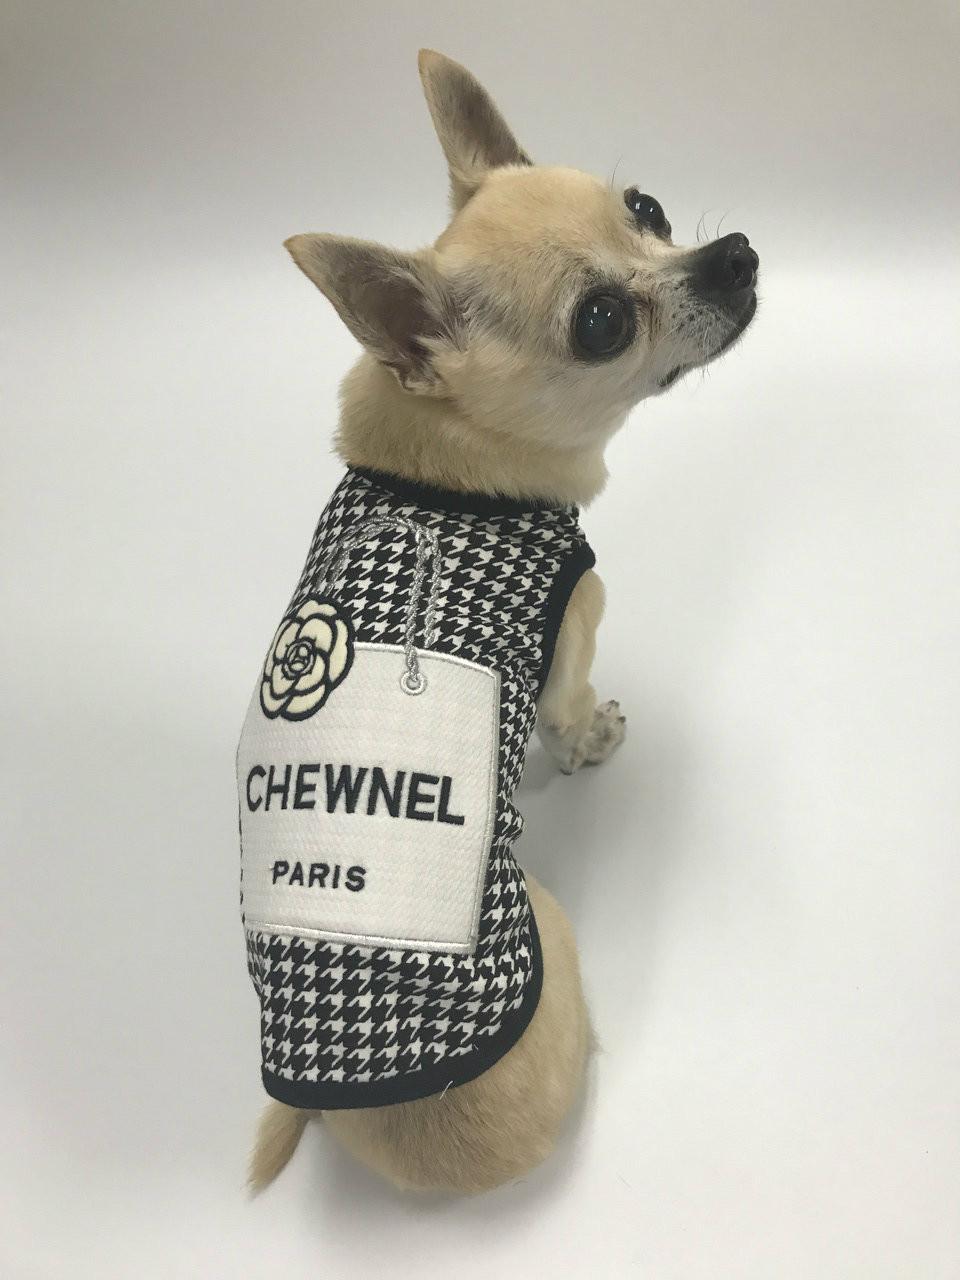 Chewnel Shopping Bag Dog Tanks By Luna Blue